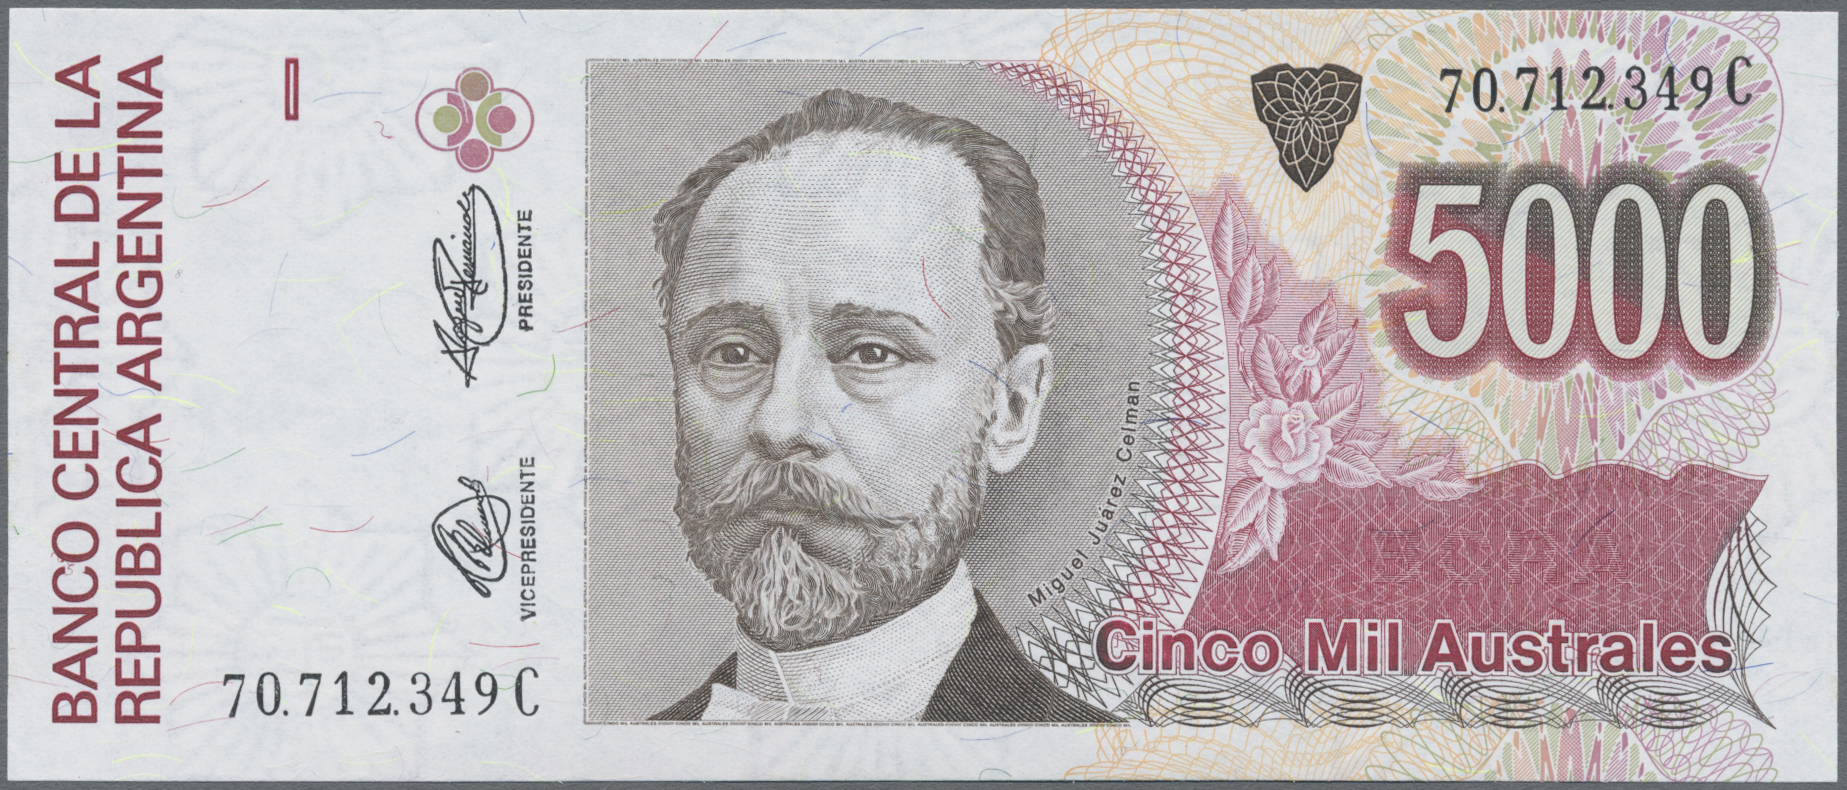 Lot 00354 - Argentina / Argentinien | Banknoten  -  Auktionshaus Christoph Gärtner GmbH & Co. KG 51th Auction - Day 1